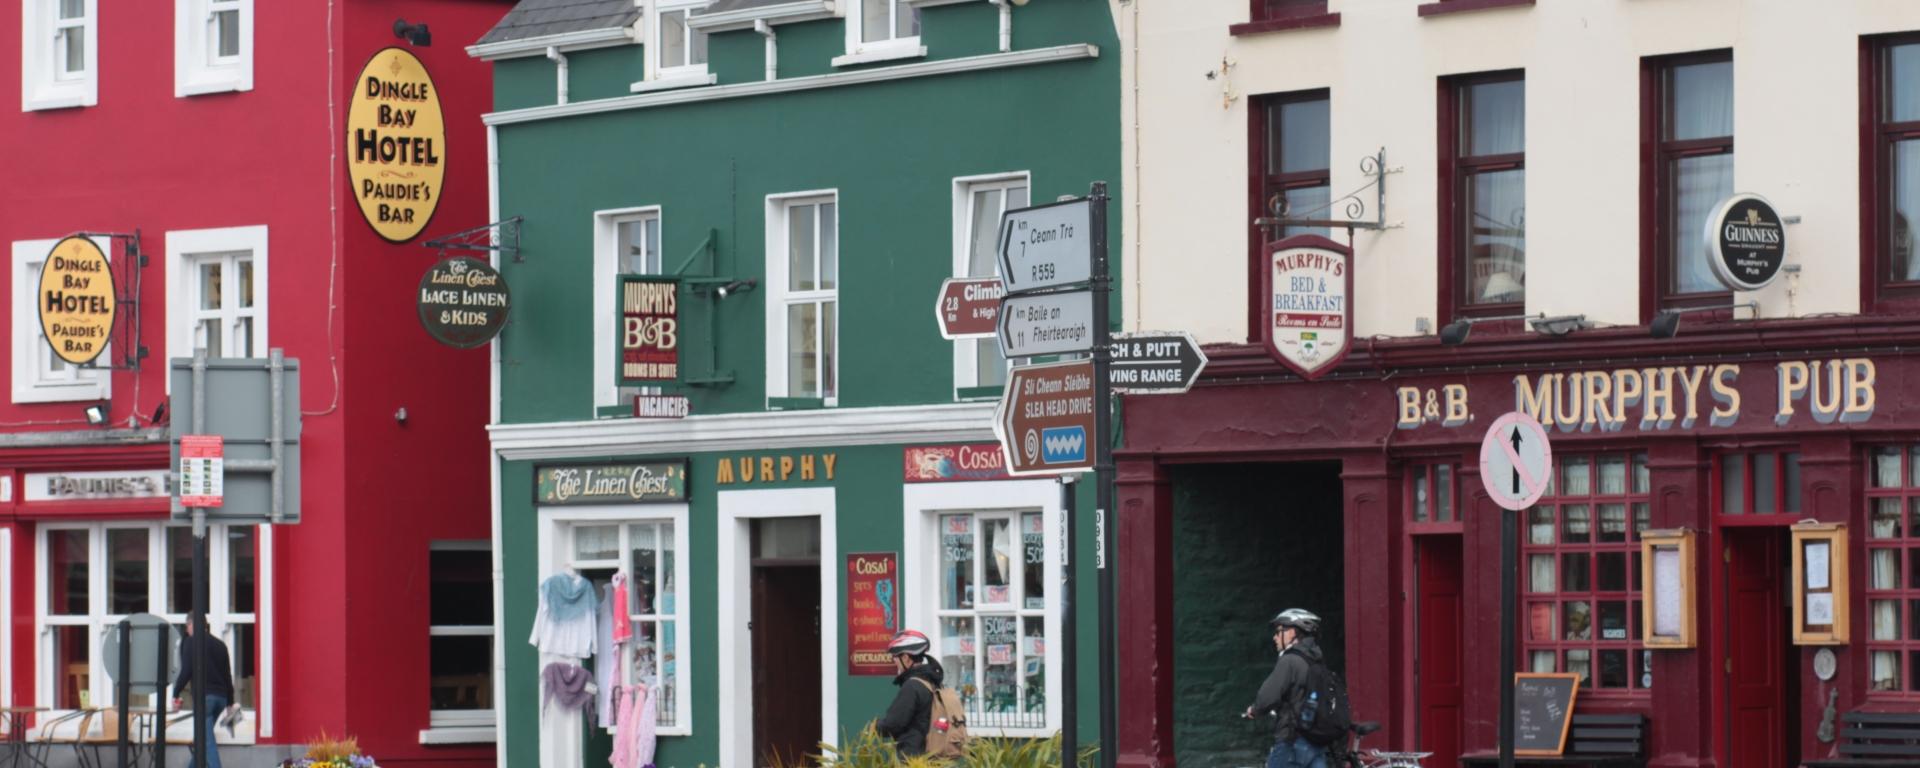 Dingle, Ireland, Dingle Ireland,